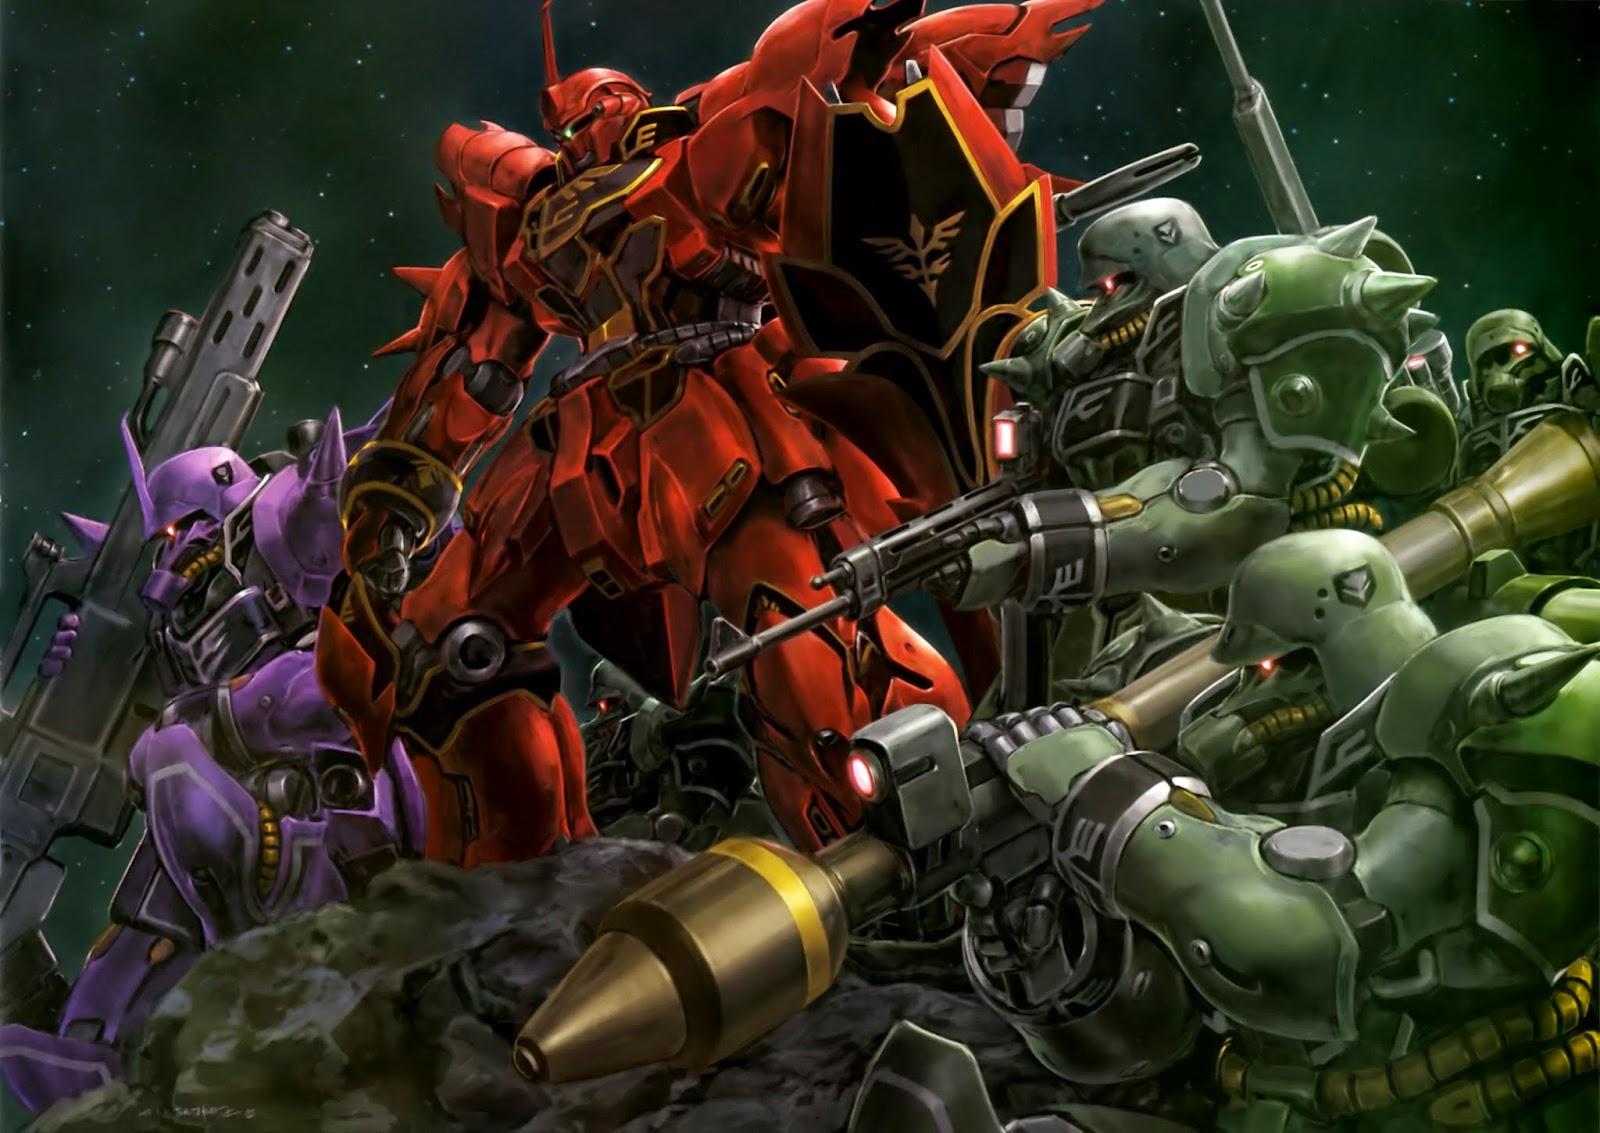 Gundam Exceed RX782 Gundam Wallpaper Images Gundam